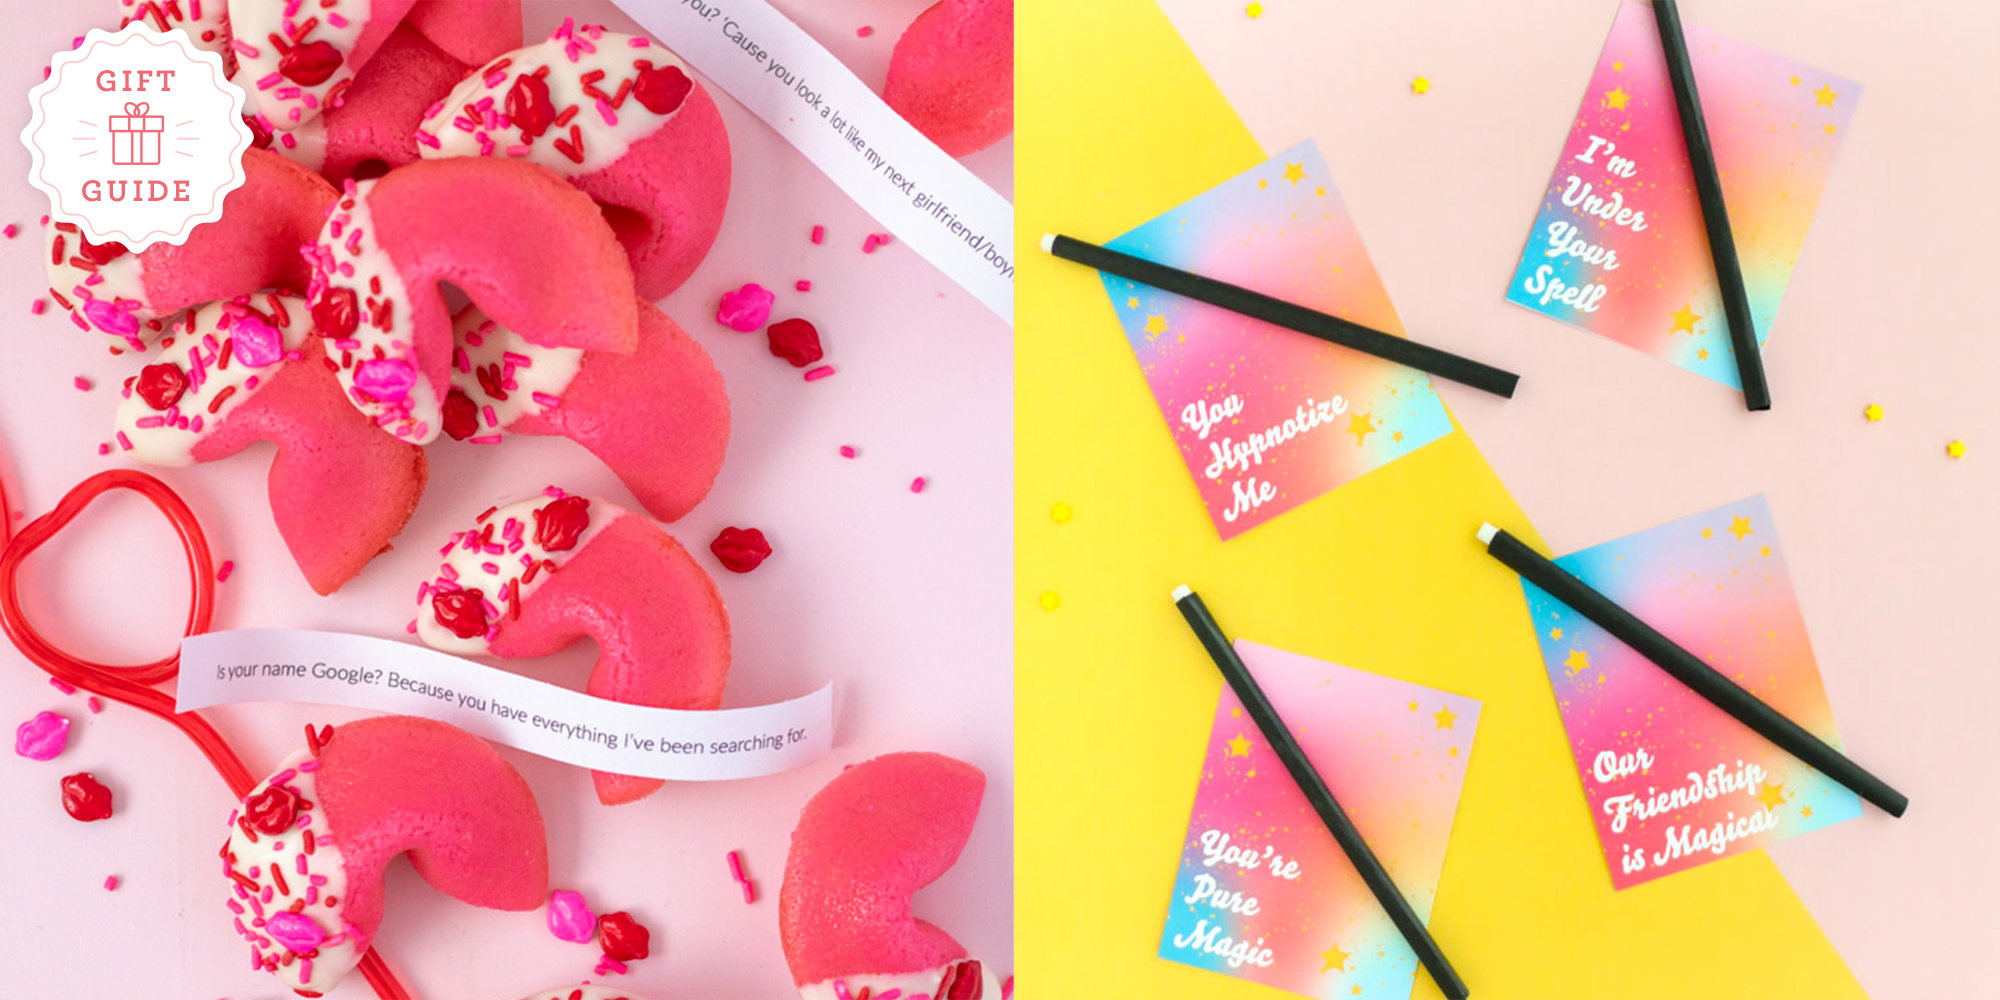 40 Diy Valentine S Day Gift Ideas Easy Homemade Valentine S Day 2021 Presents